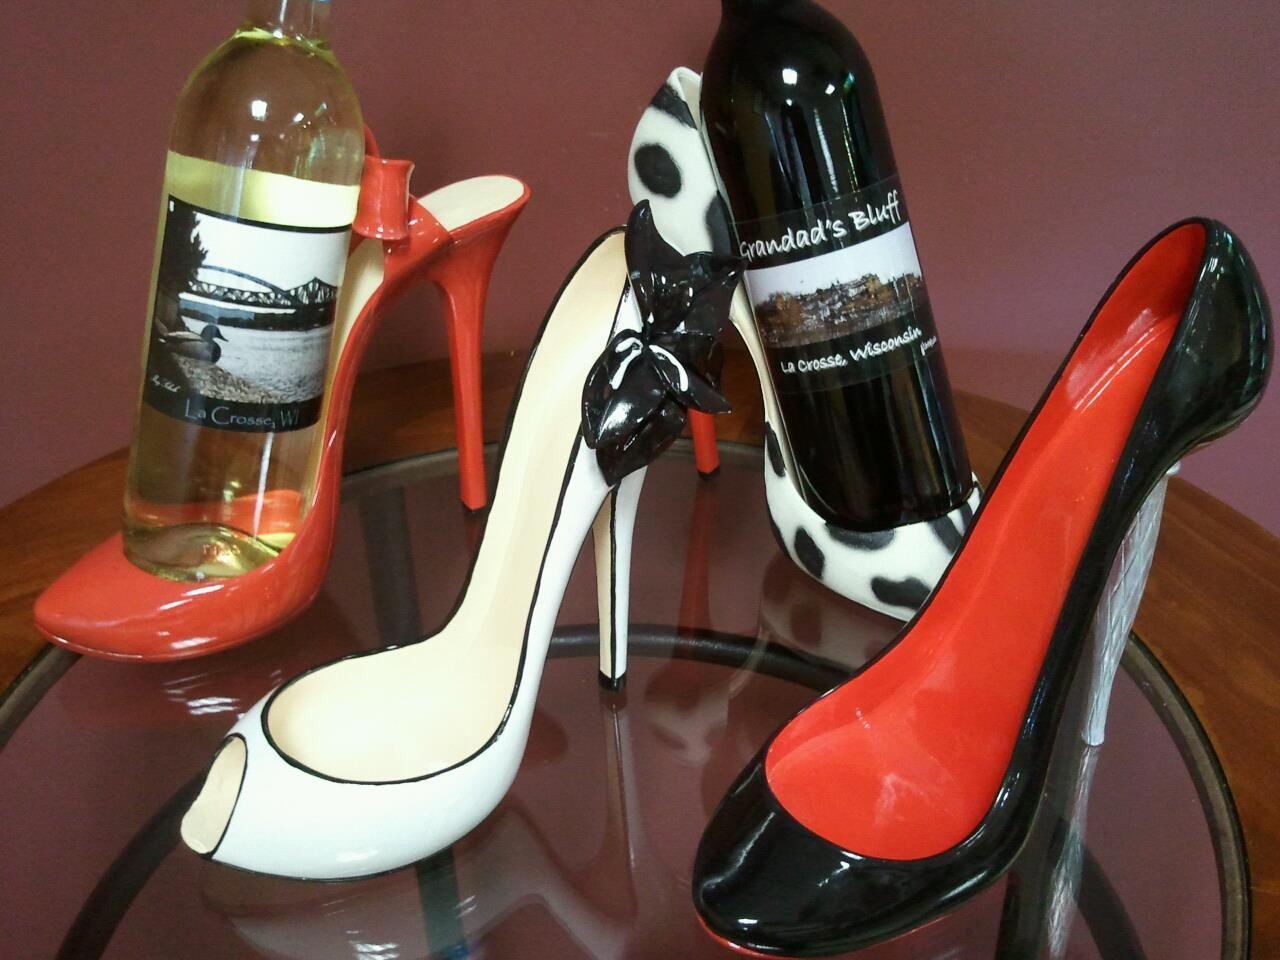 Unwine D Wine Bar Gift Boutique Onalaska Wi Bar Gifts Gift Boutique Wine Bottle Holders